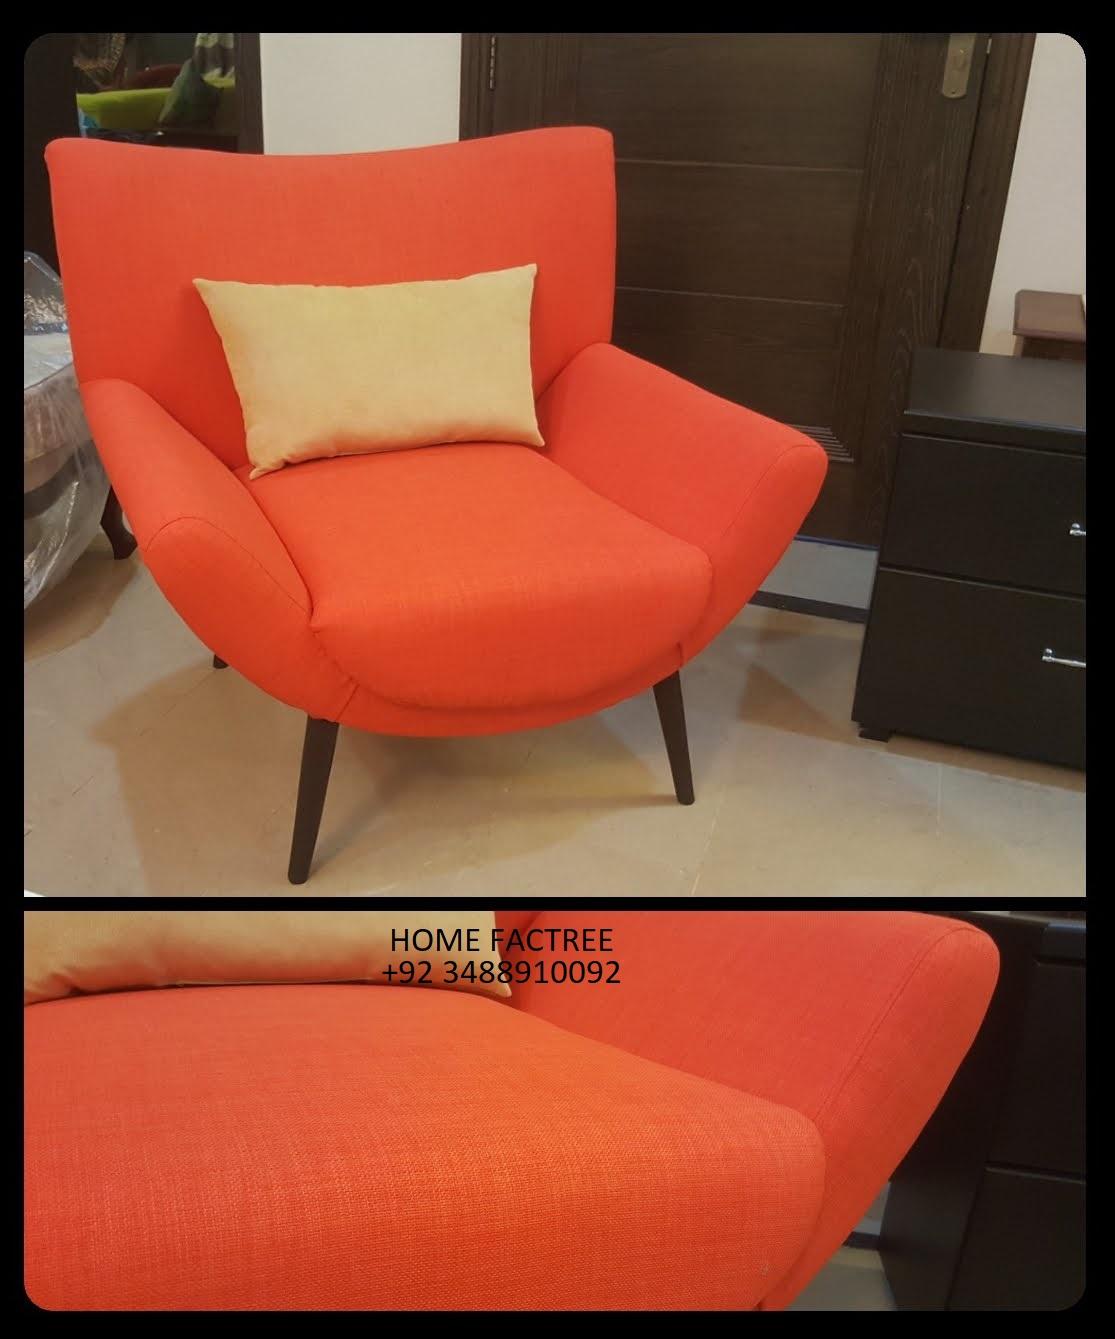 Daska Accent Chair Home Factree